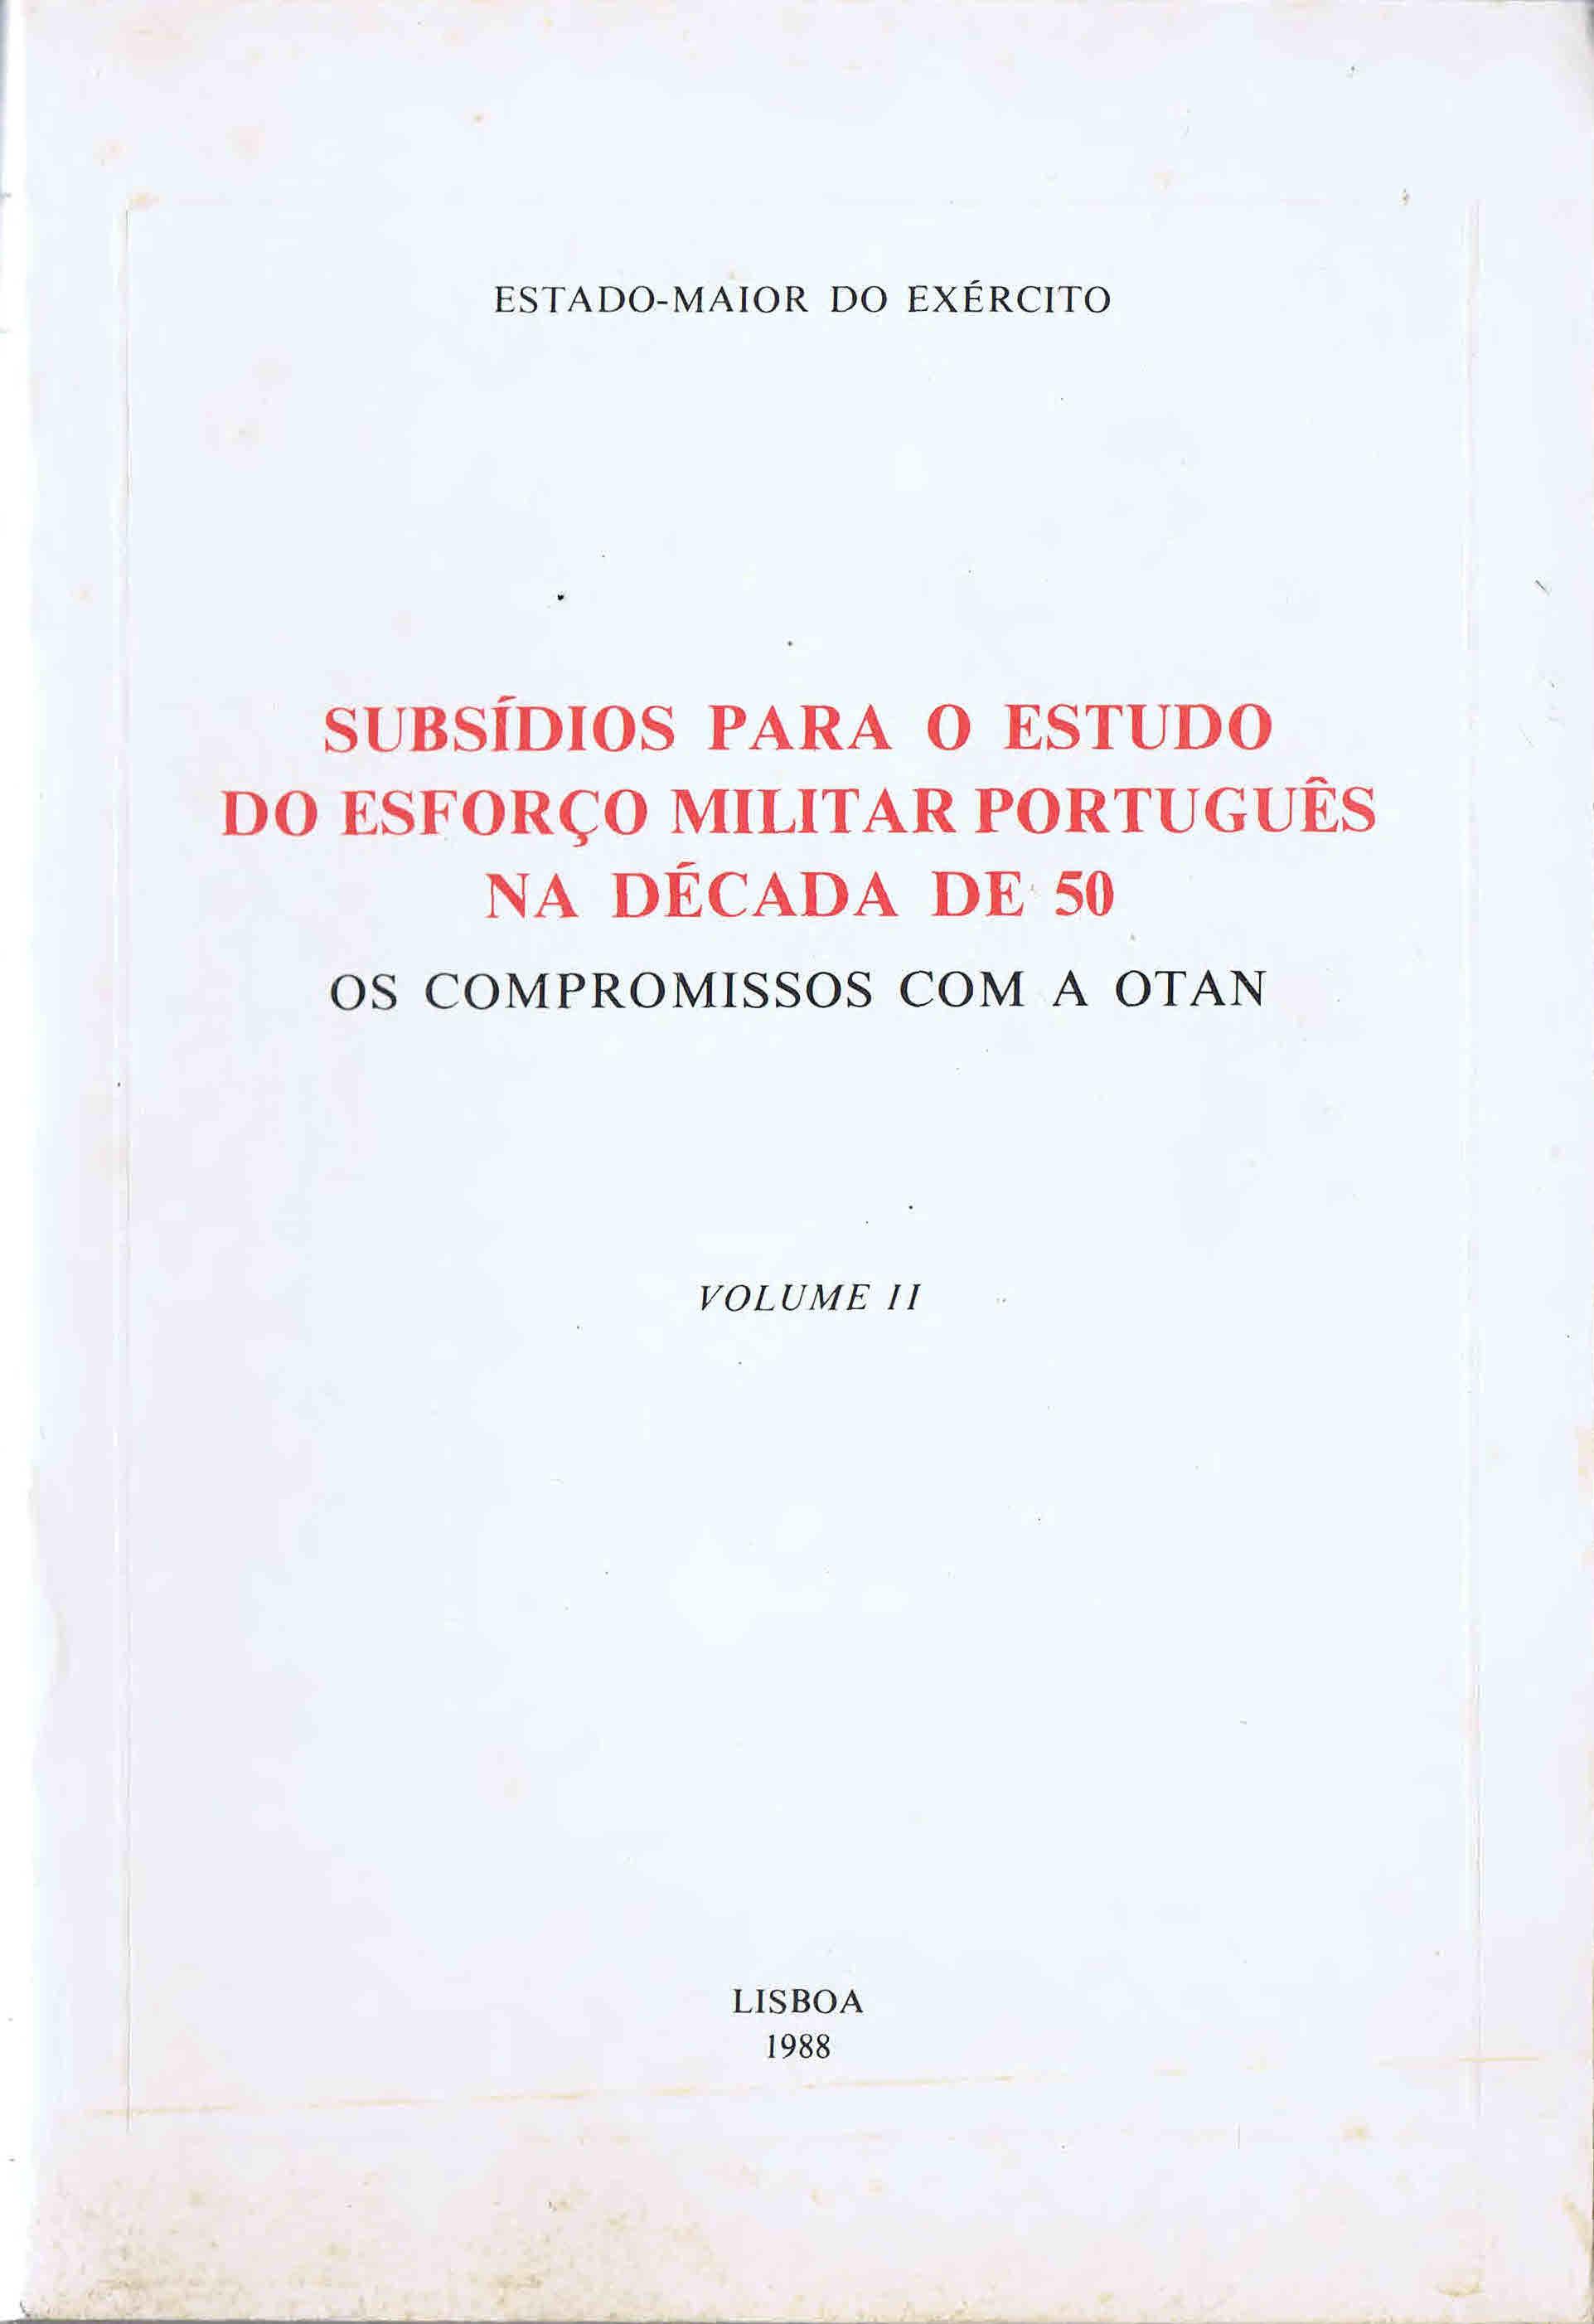 Copy of 28-07-12 (11)